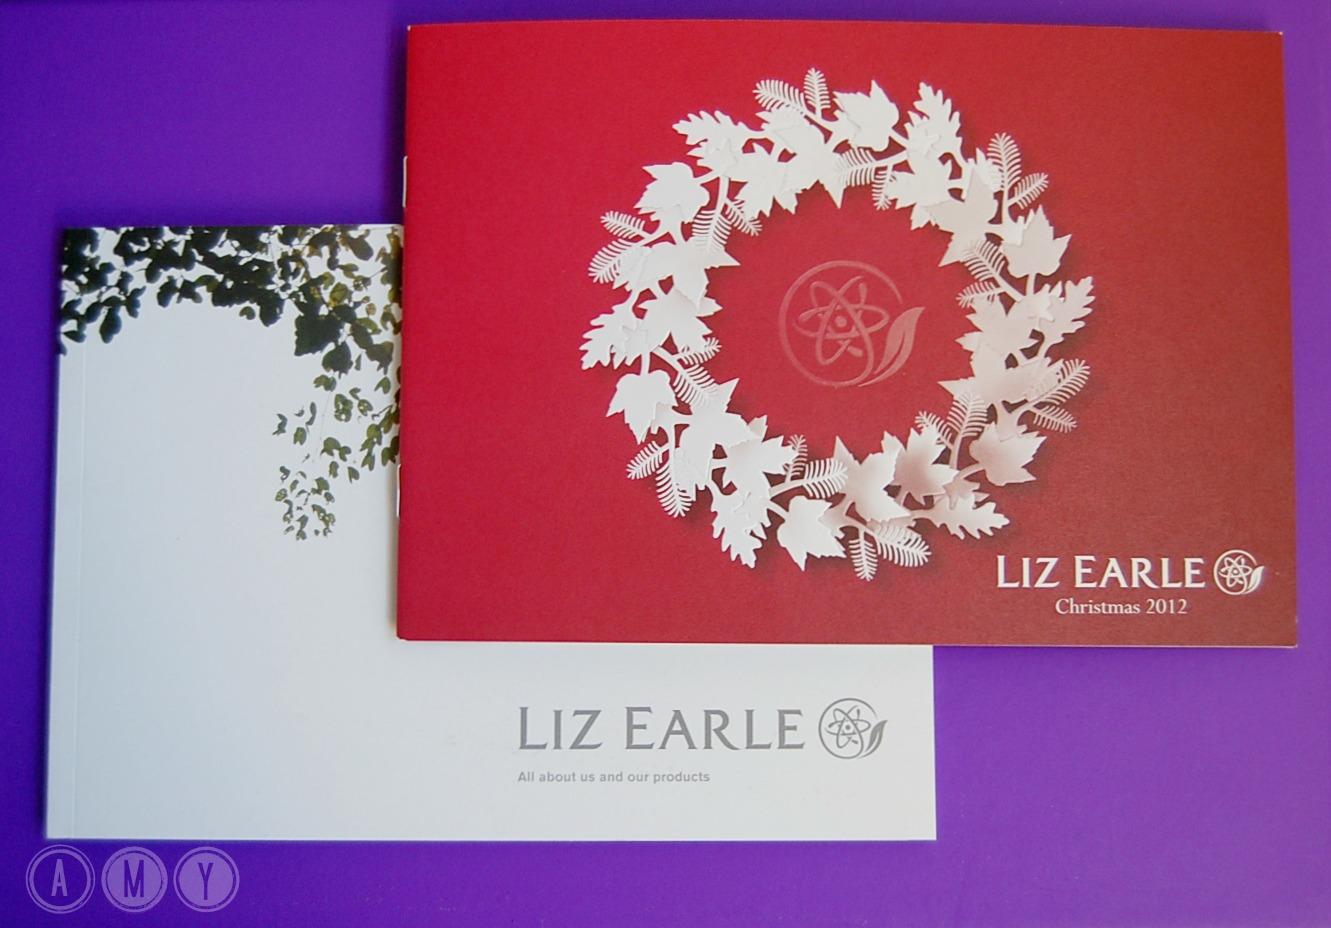 Liz Earle Online Order